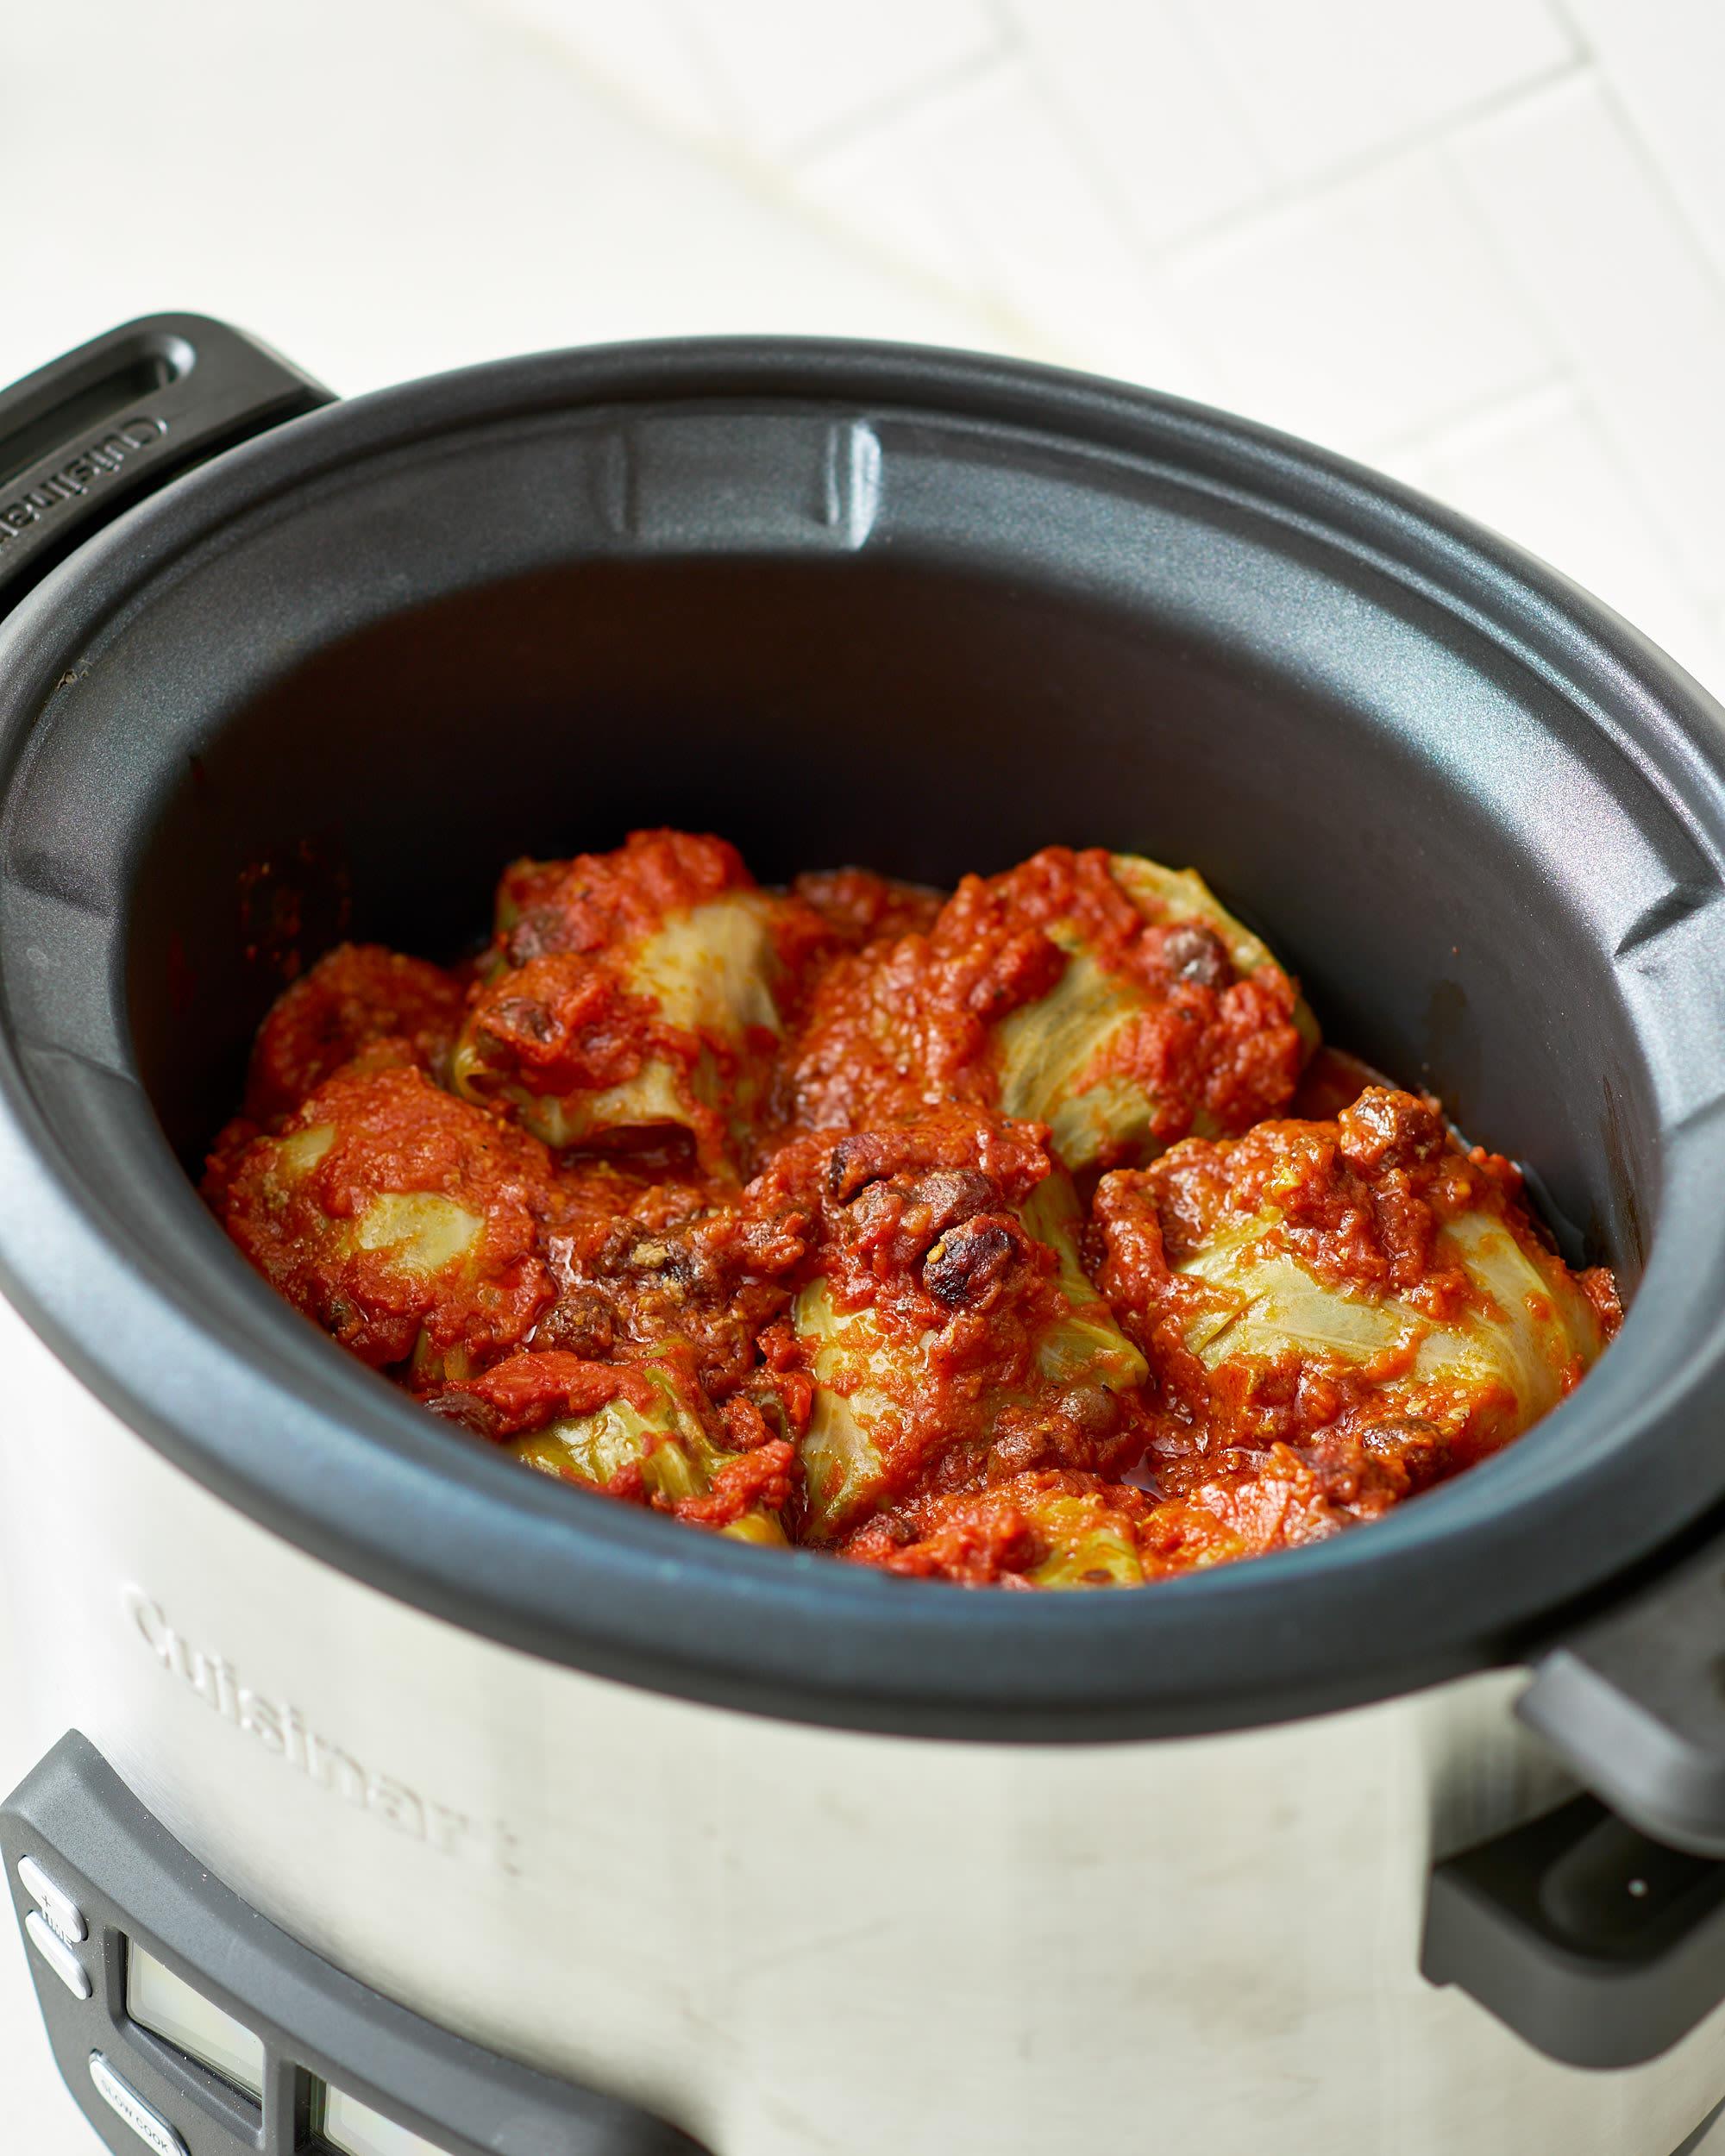 Recipe: Slow Cooker Stuffed Cabbage Rolls